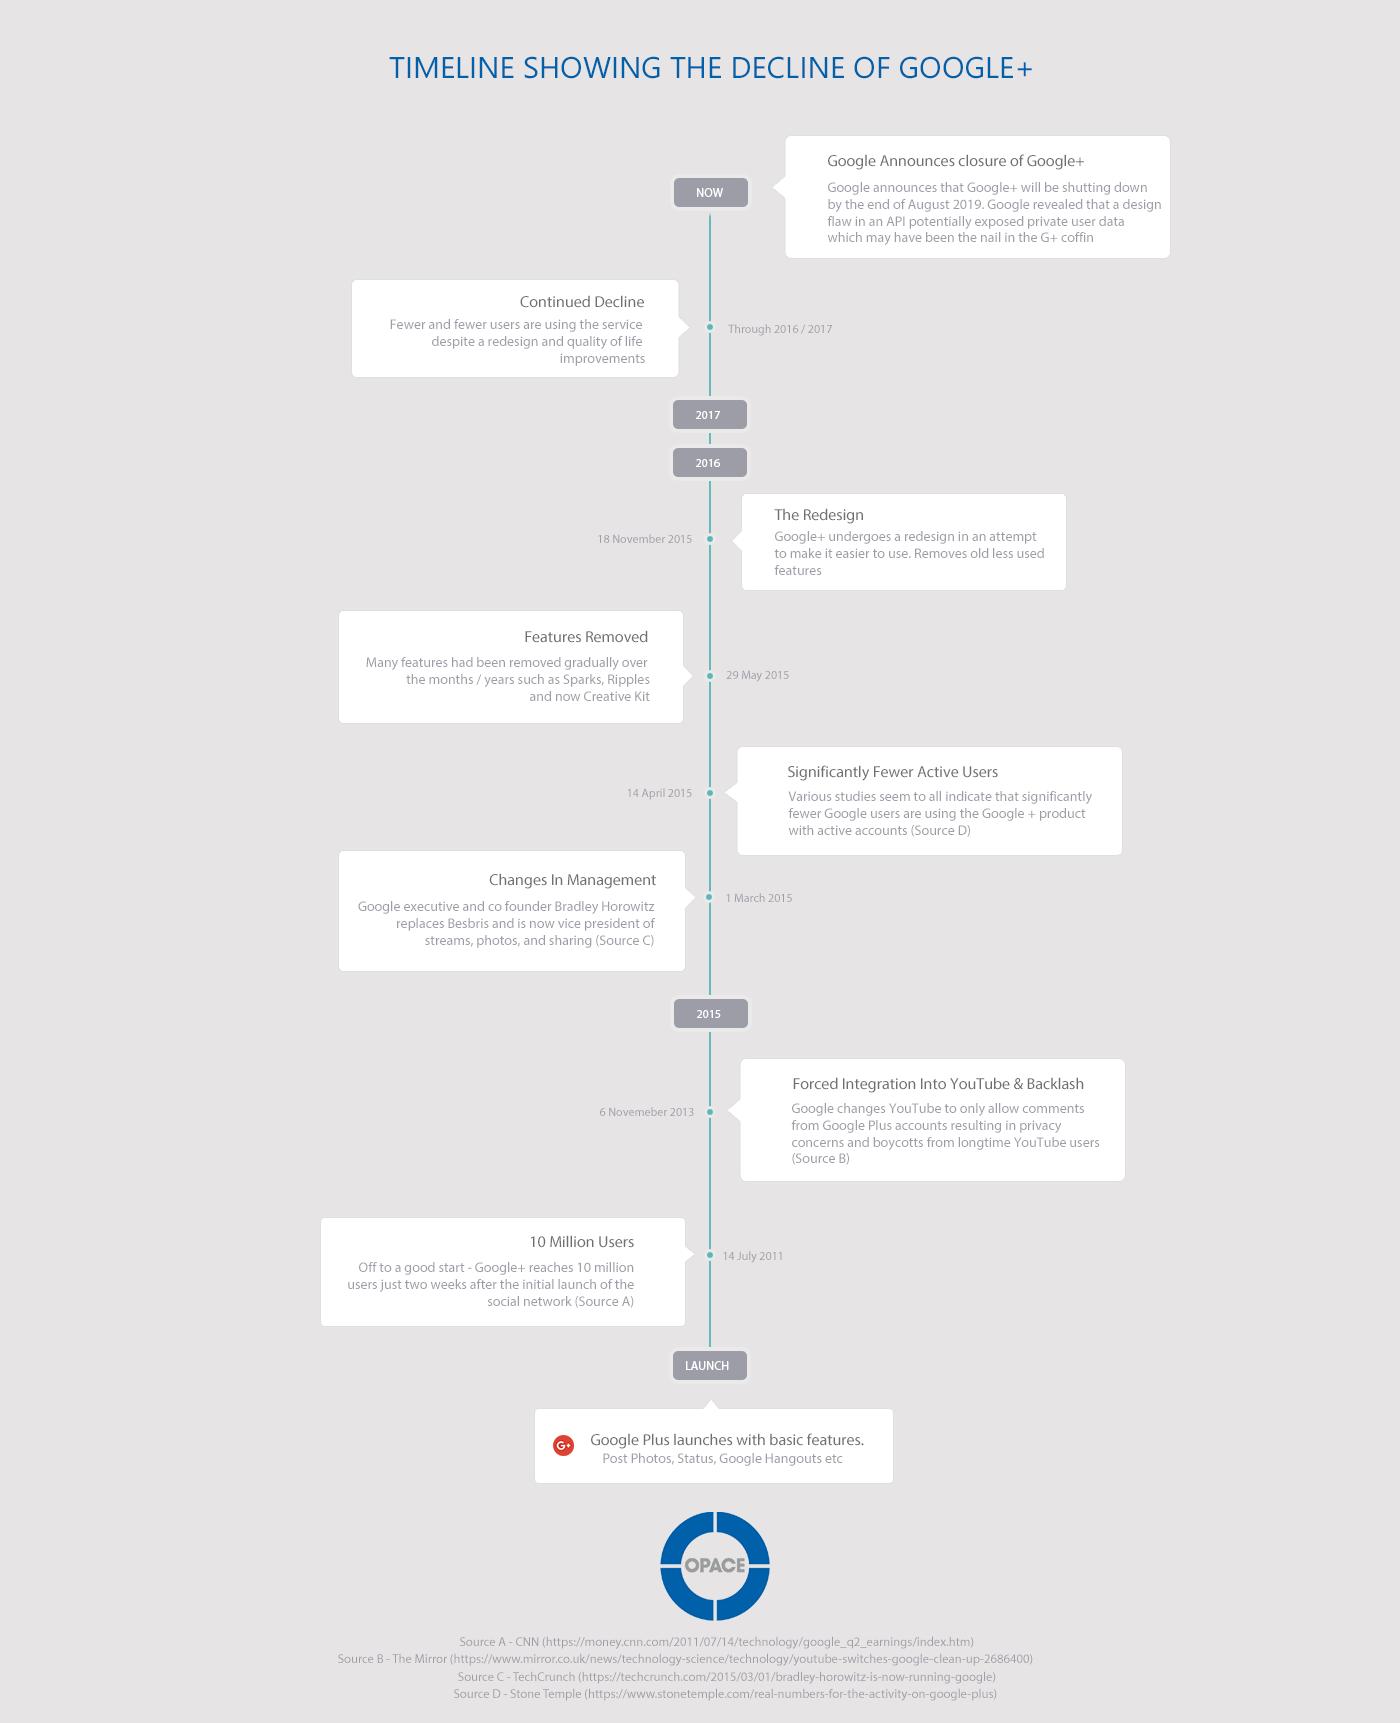 Google Plus Timeline Decline